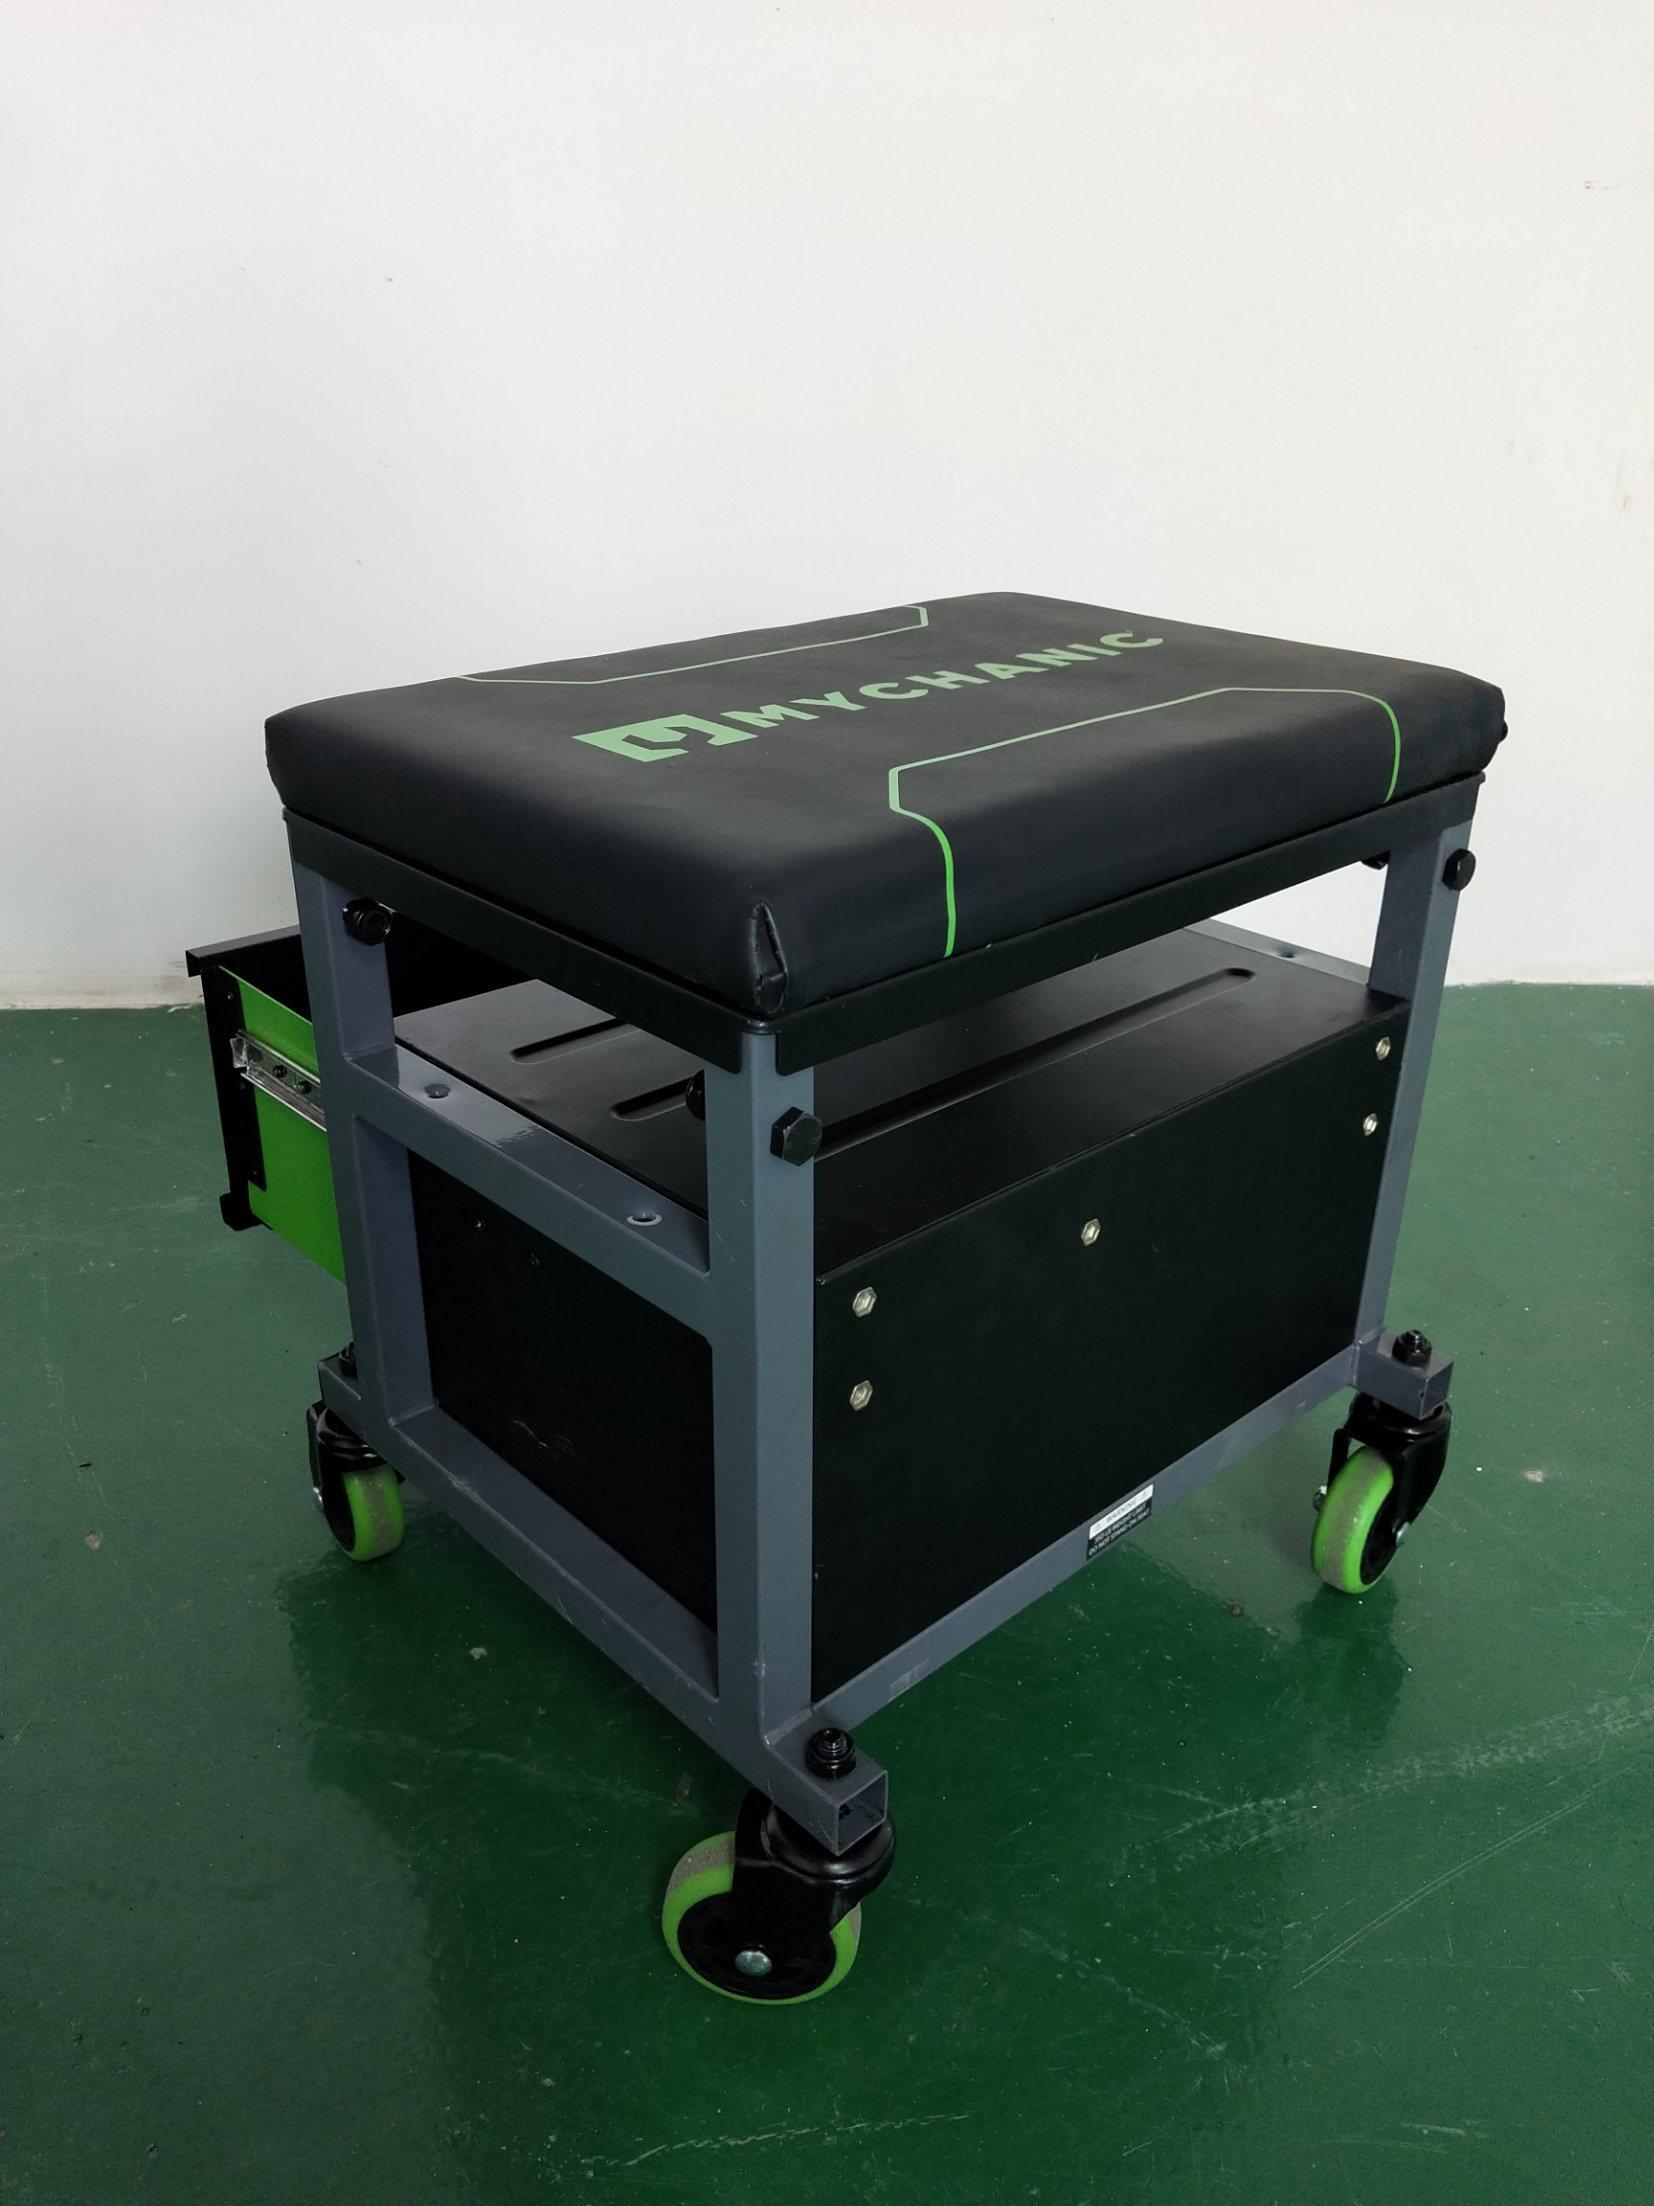 Mechanics Creeper Adjustable Rolling Creeper Seat Mechanic Stool Chair Garage